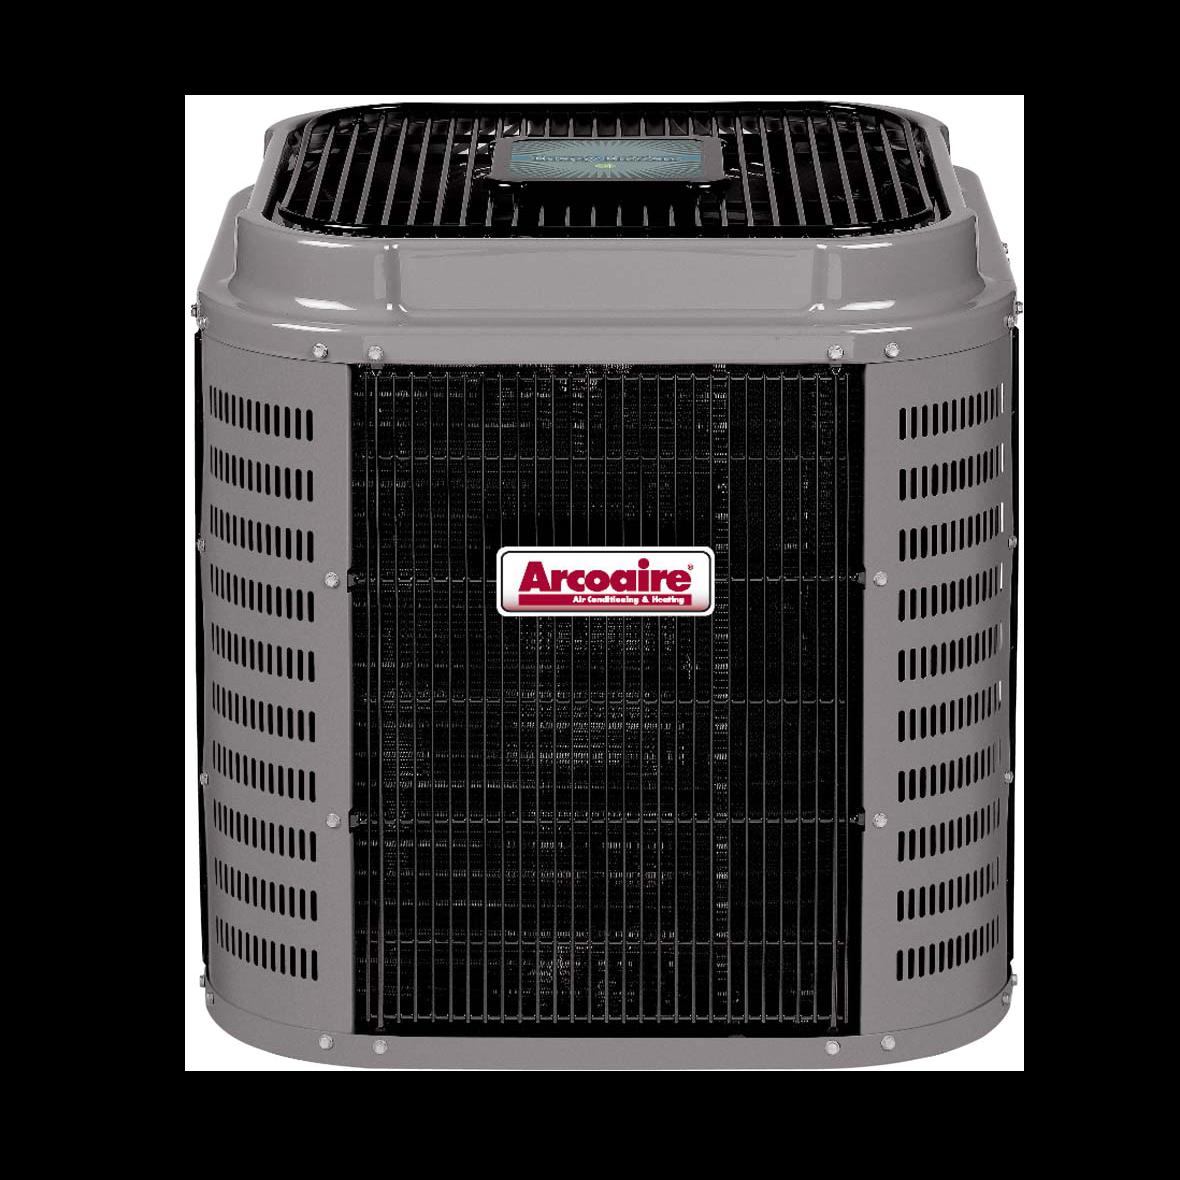 Hsa6 Central Air Conditioner Ac Unit Arcoaire